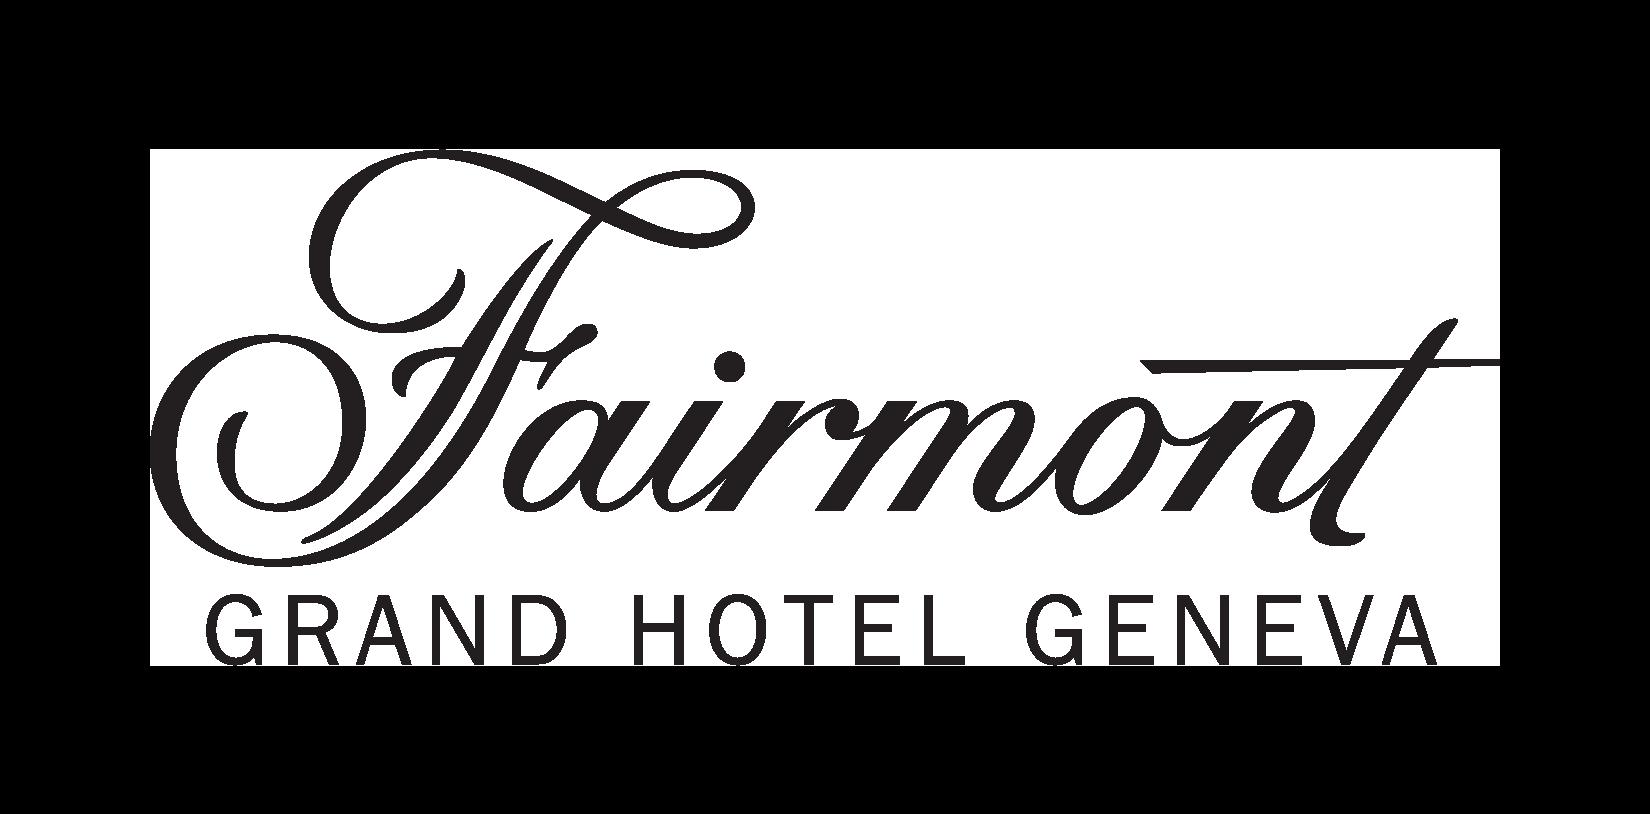 Fairmont Grand Hotel Geneva logo